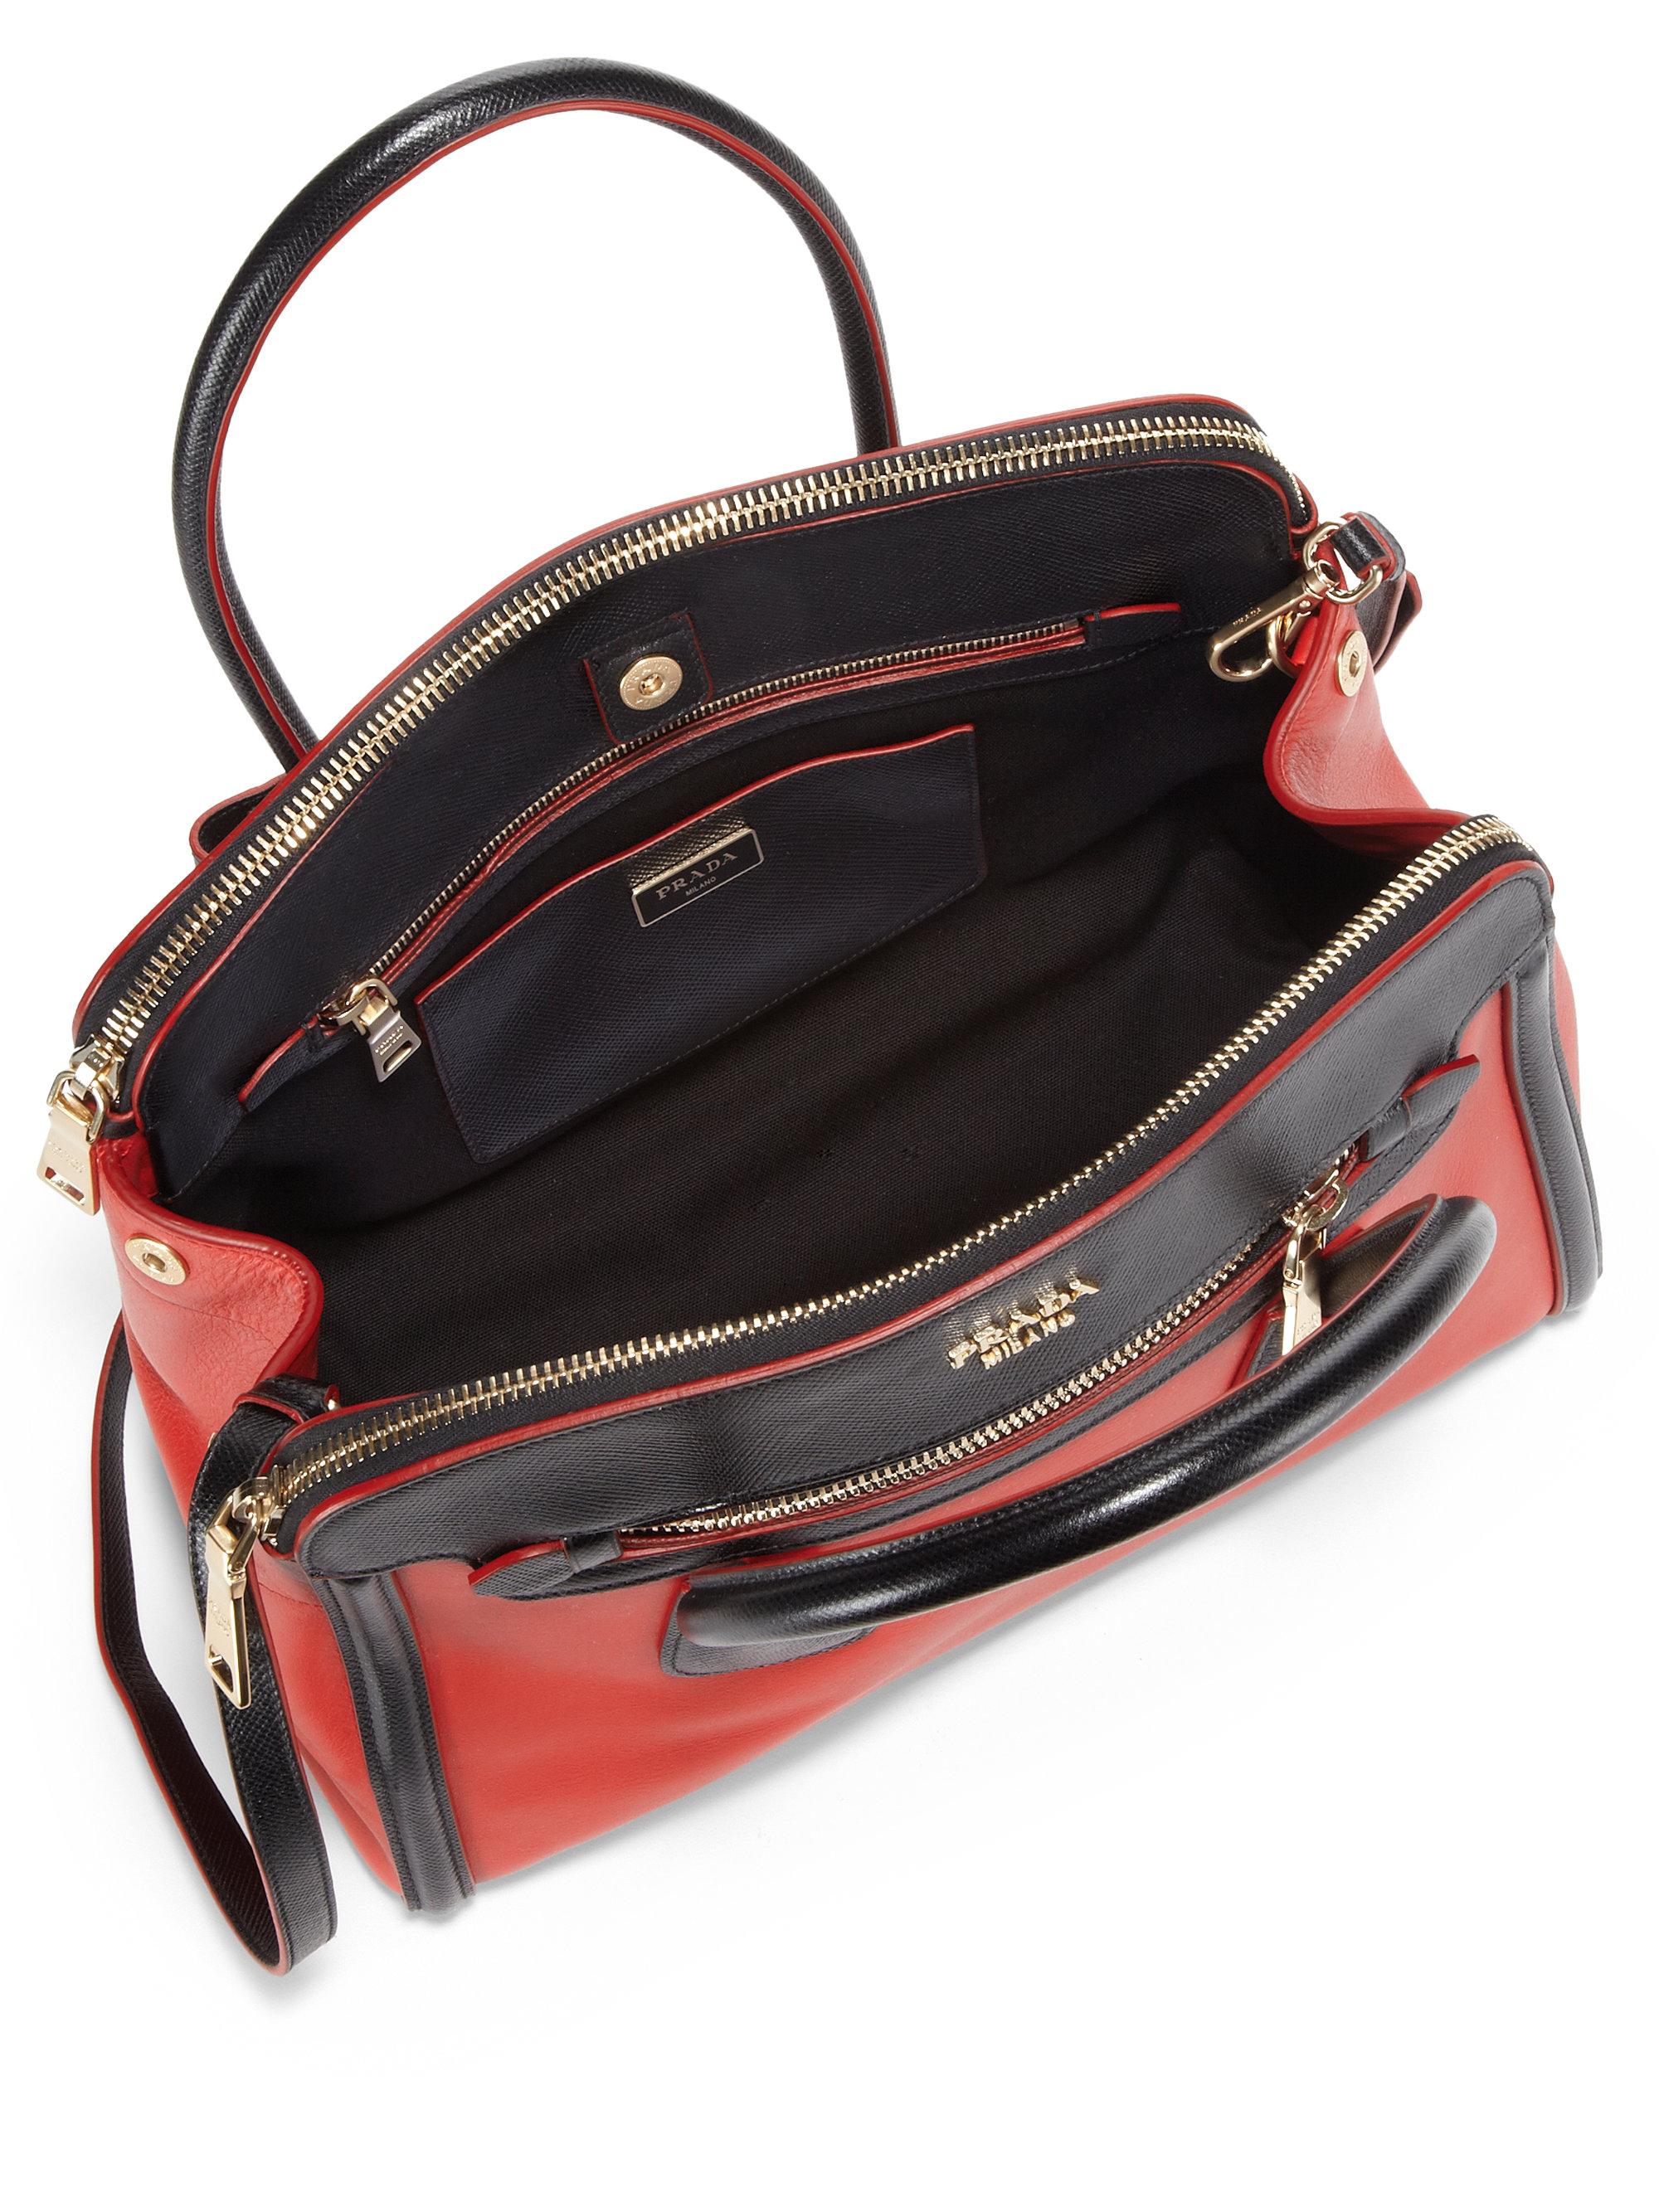 prada brown tote - prada medium bicolor leather satchel, prada sale wallet